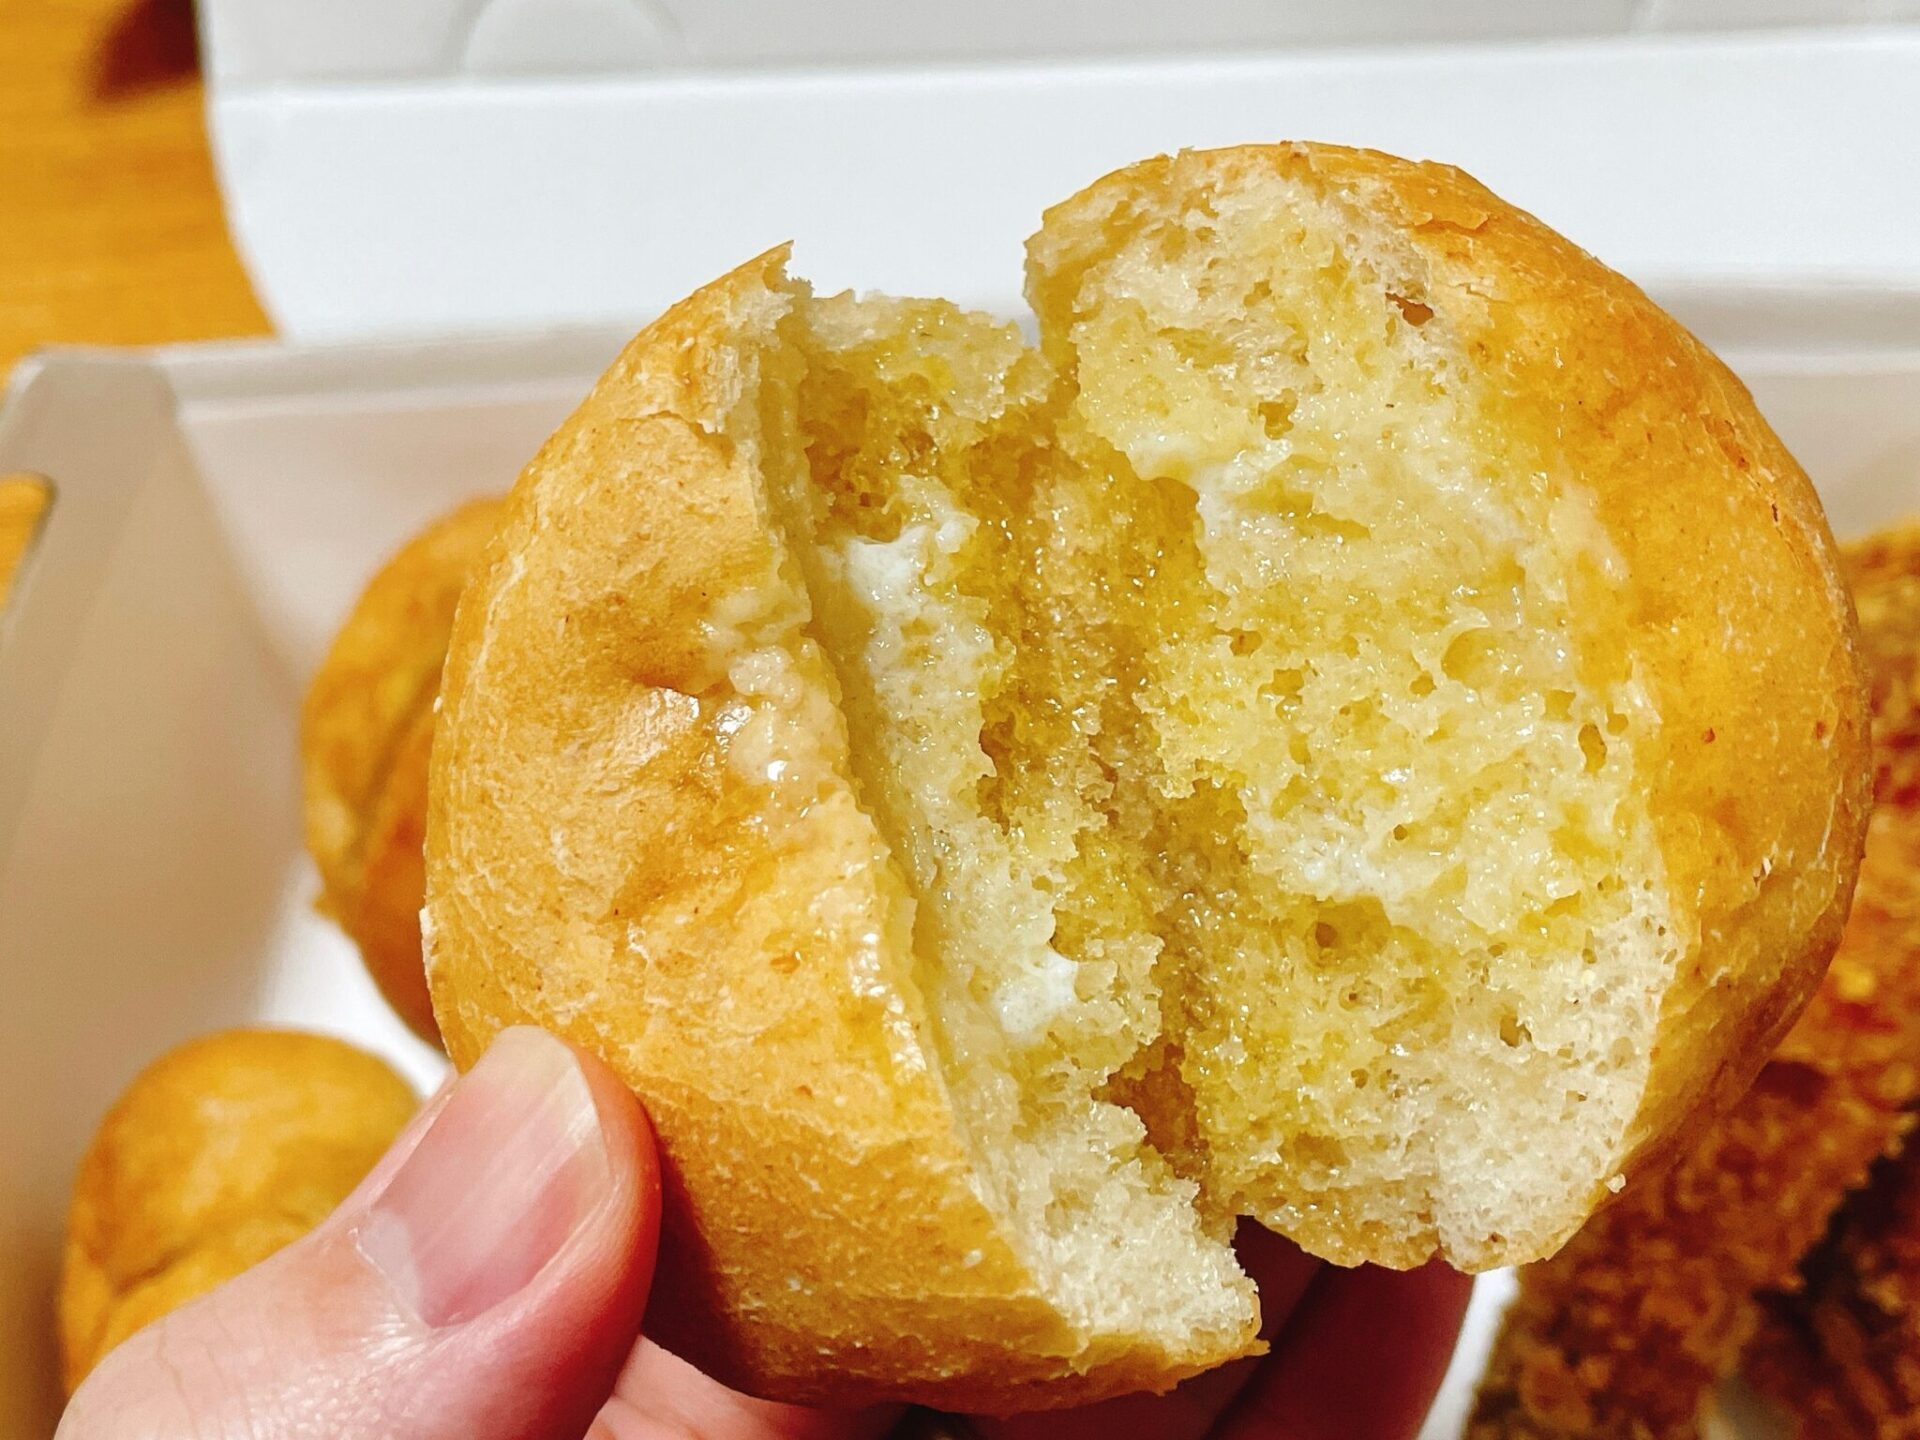 bb.q OLIVE CHICKEN cafeのパン ハニーブレッド